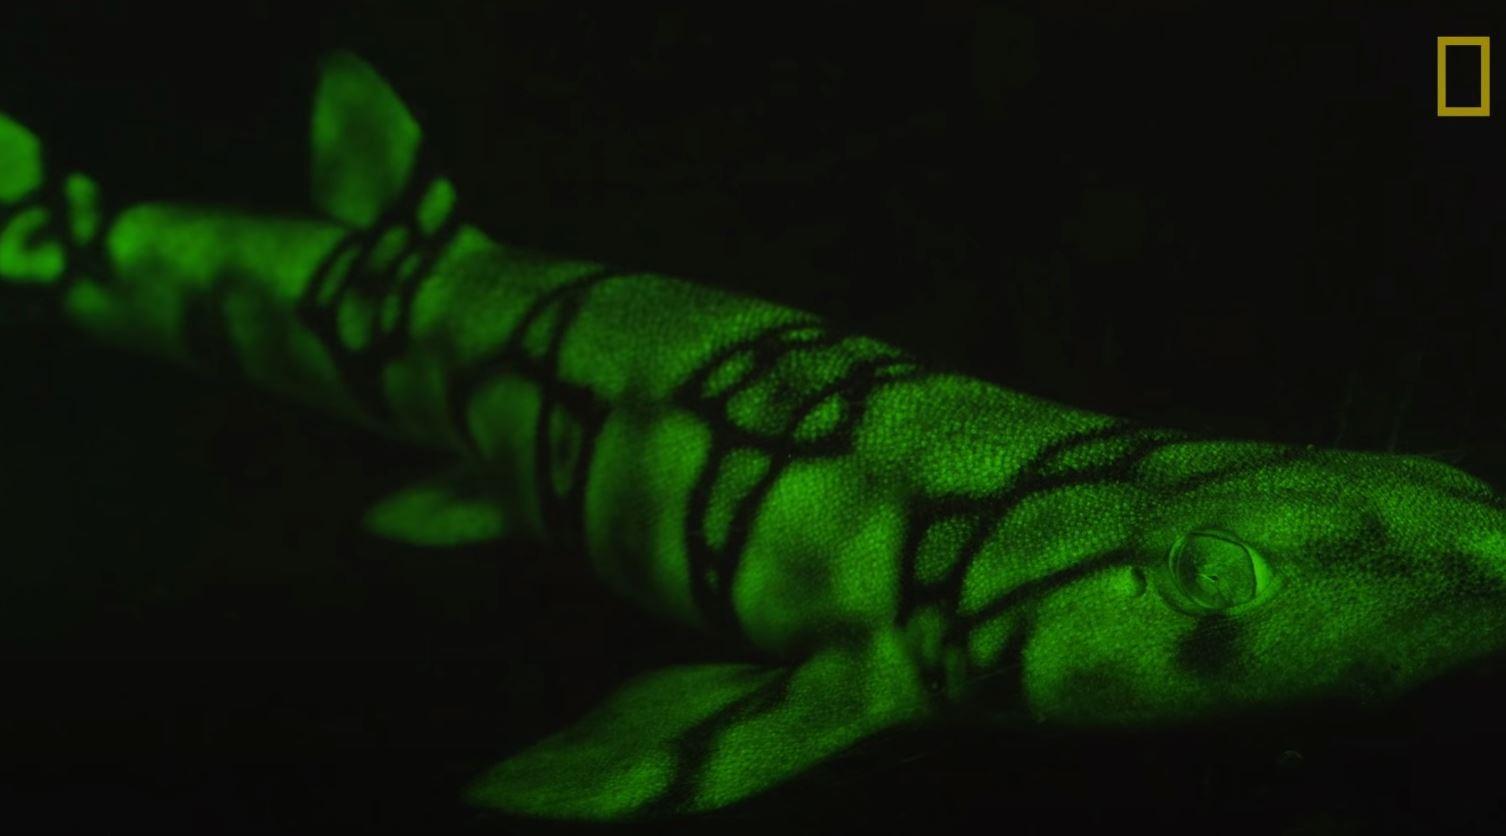 Glow-in-the-dark shark